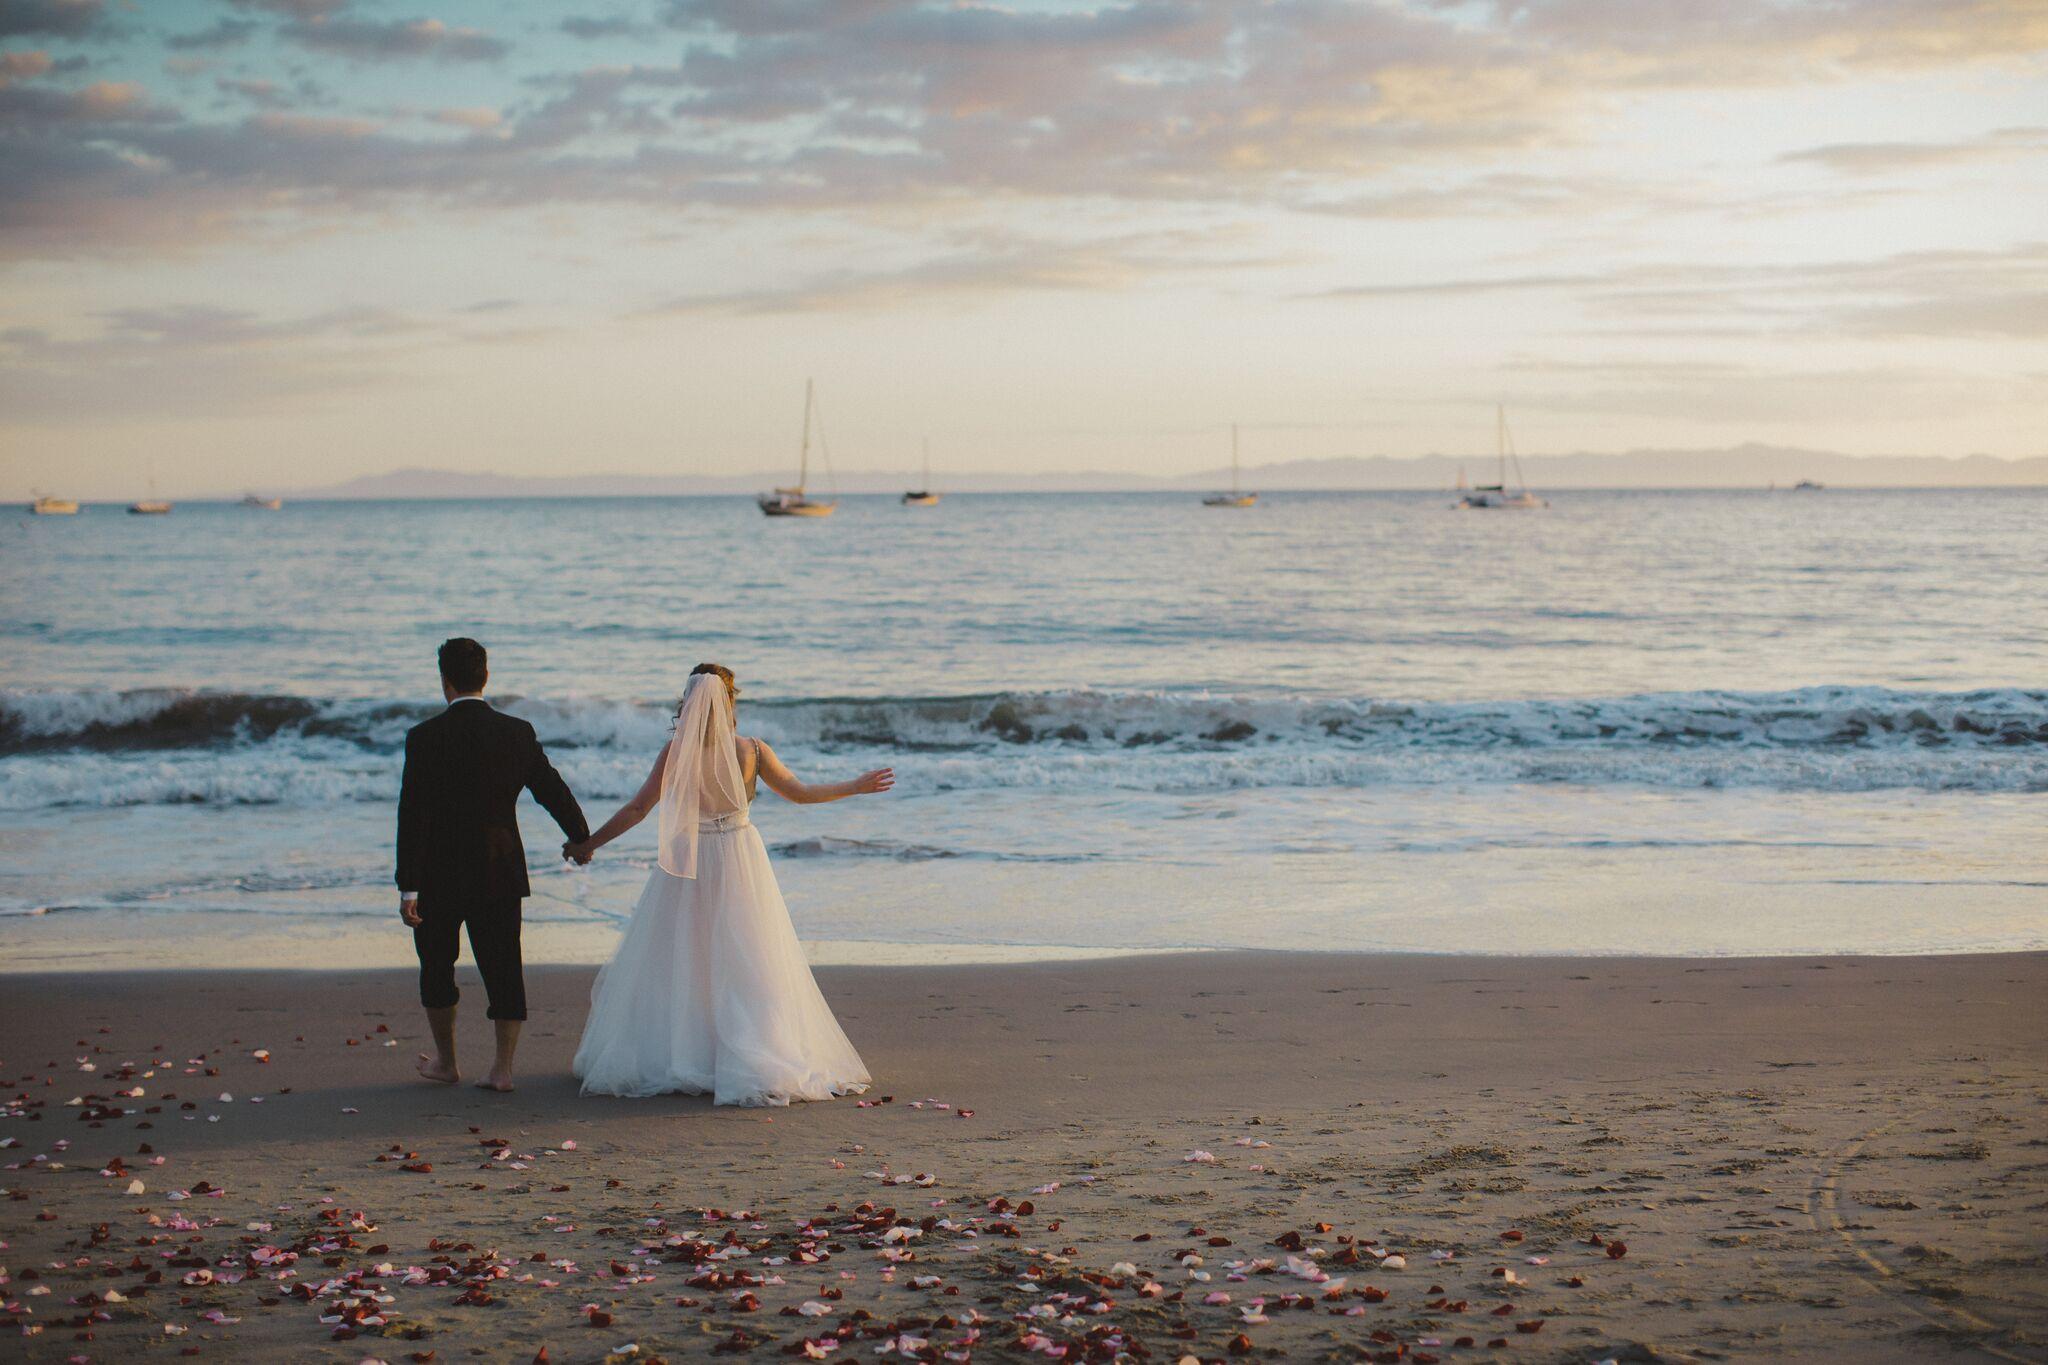 www.santabarbawedding.com | Venue: Santa Barbara Courthouse | Photography: Ryanne Bee Photography | Officiant: Santa Barbara Classic Weddings | Bride and Groom Overlooking the Ocean